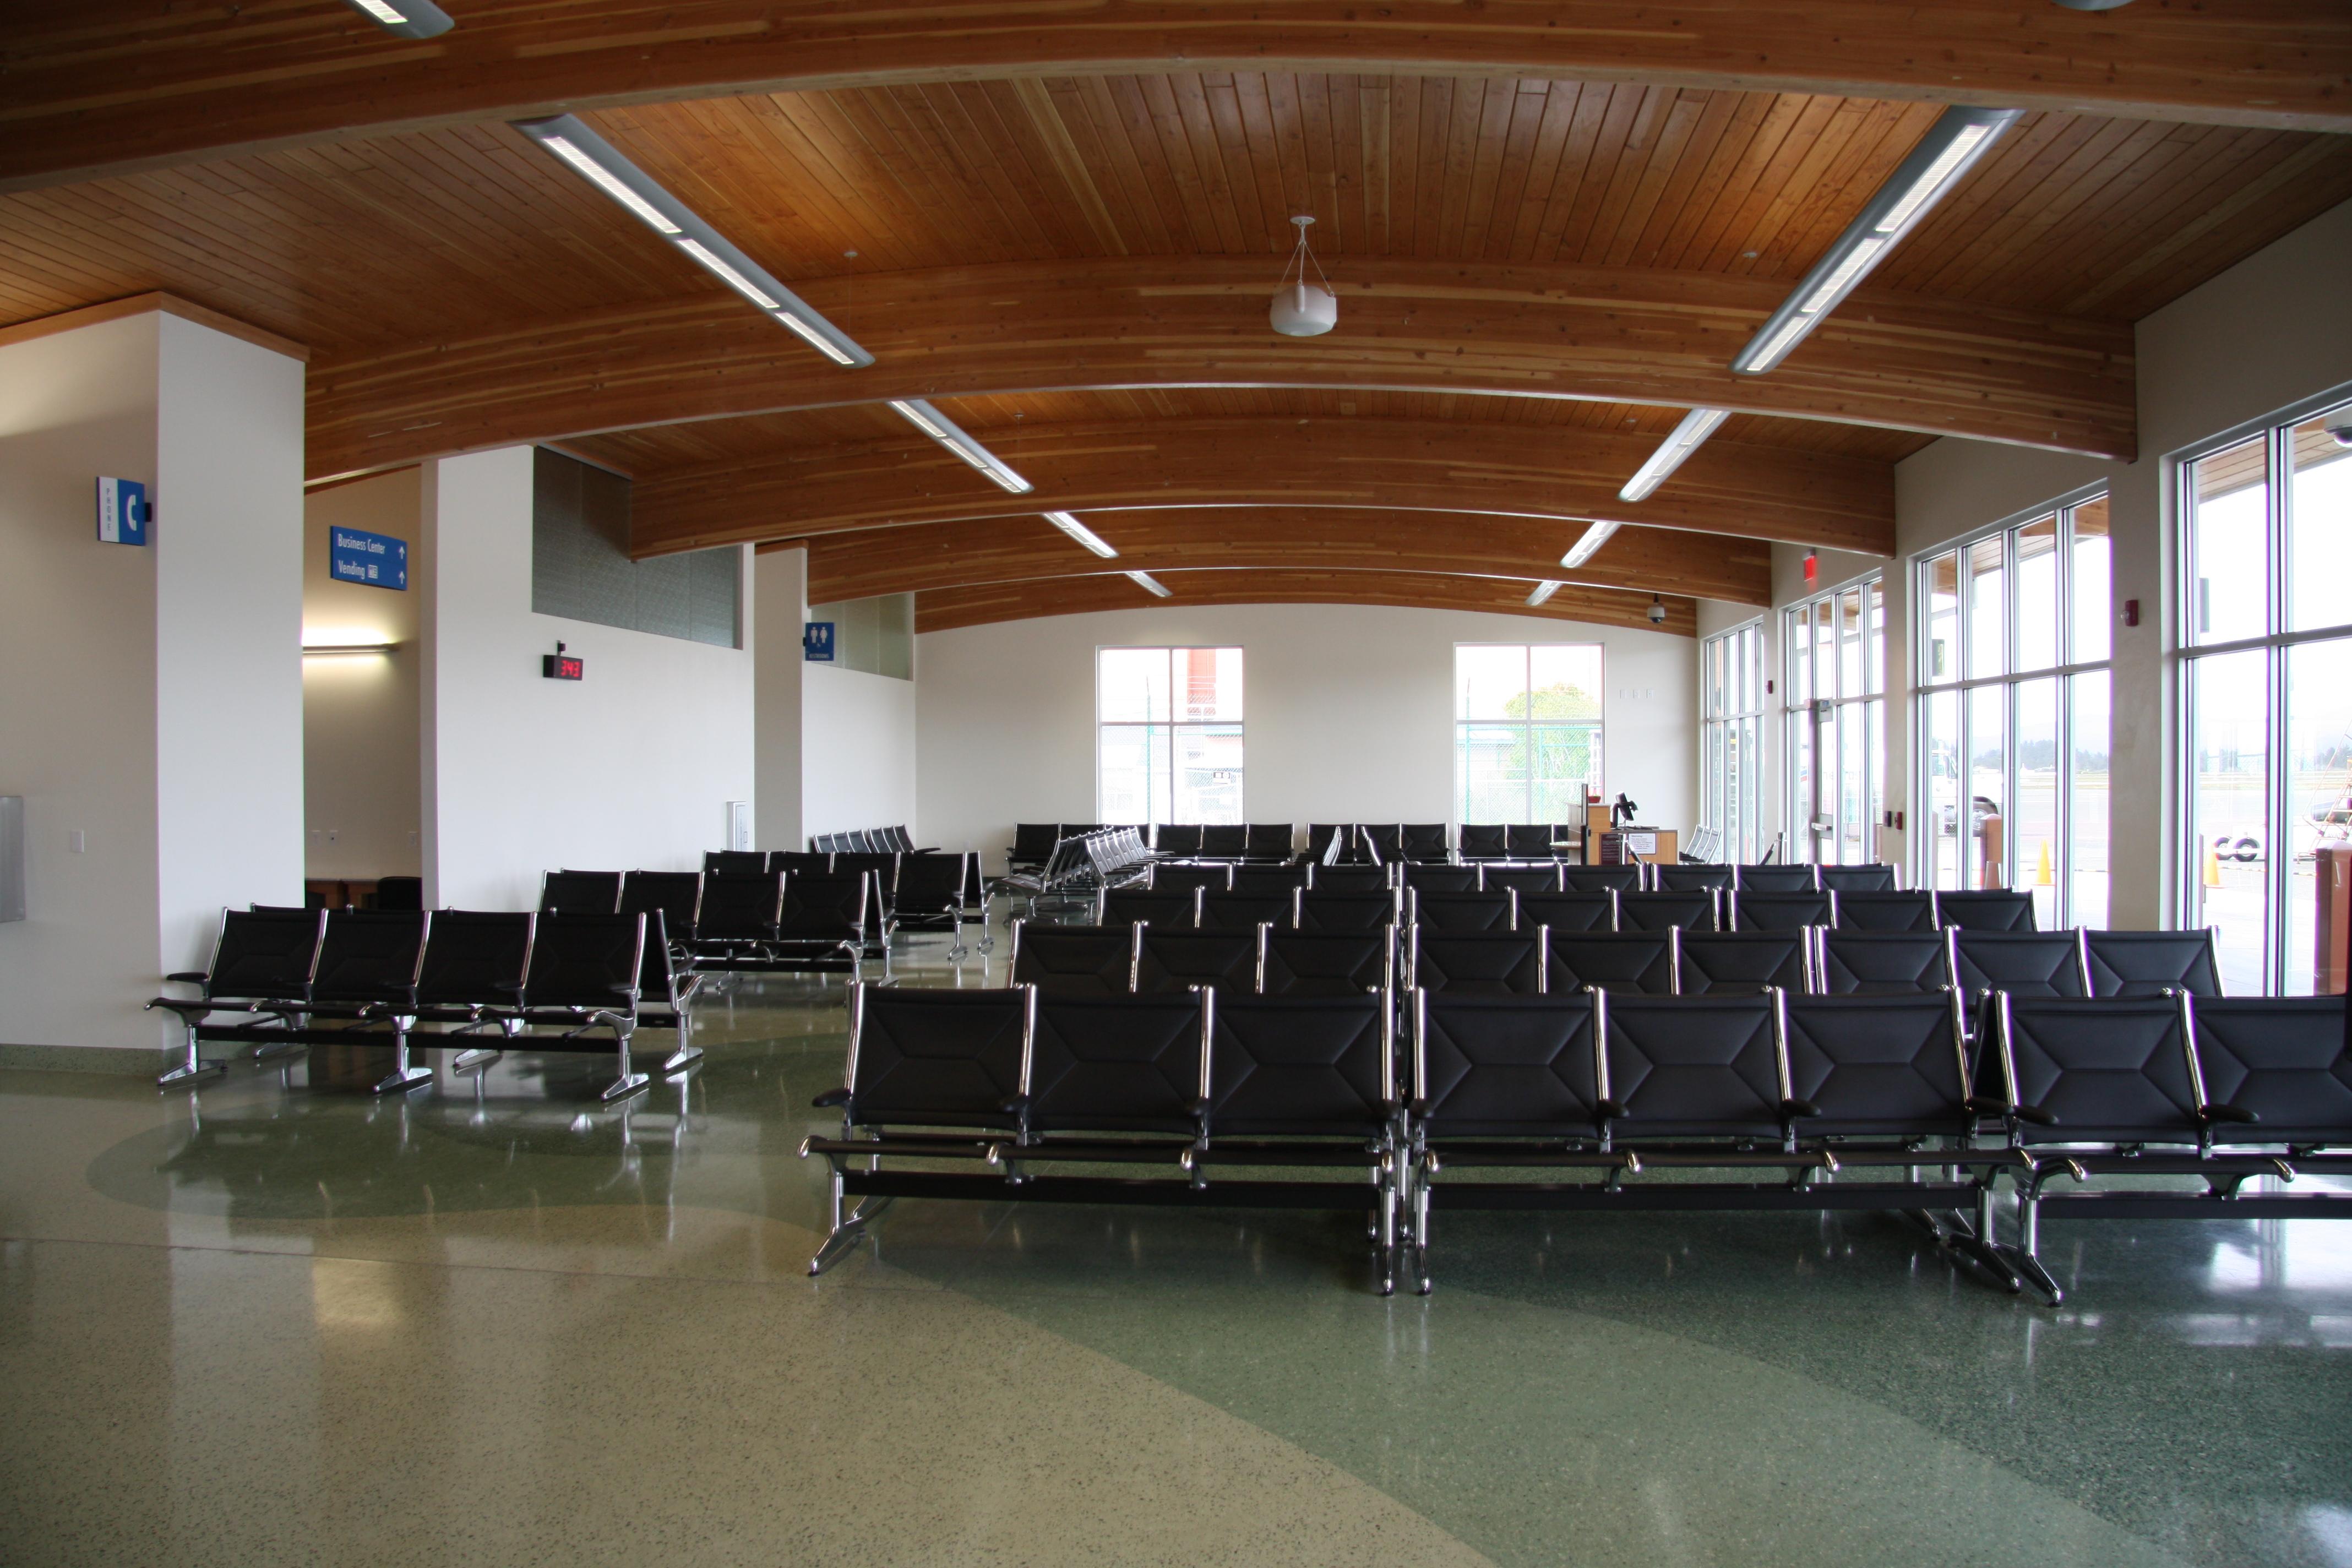 National Car Rental Arcata Airport